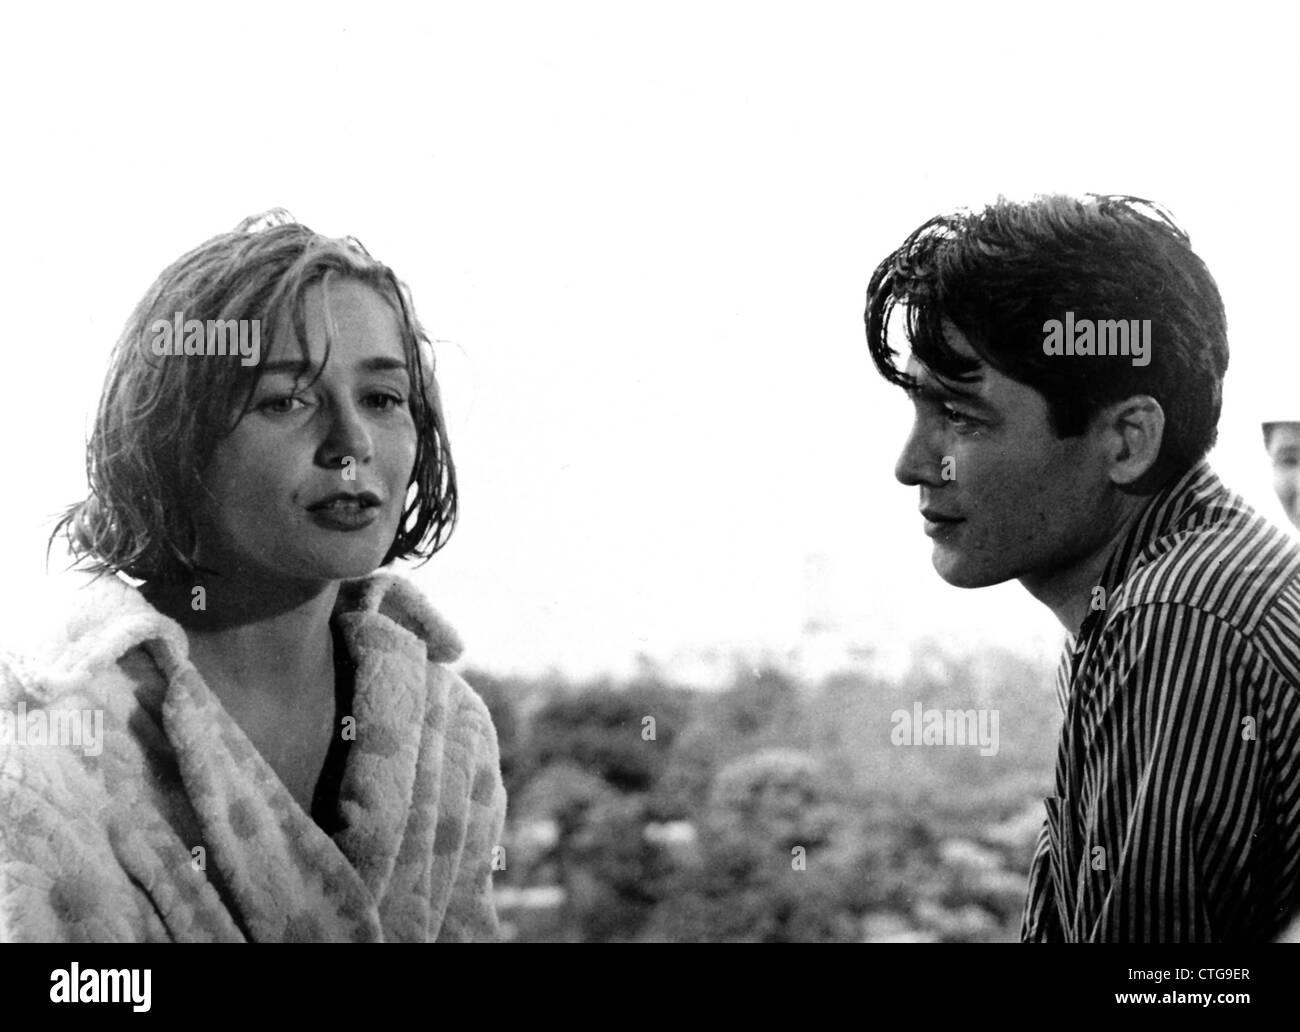 HIROSHIMA MON AMOUR (1959) EMMANUELLE RIVA, EIJI OKADA, ALAIN RESNAIS (DIR) 001 MOVIESTORE COLLECTION LTD - Stock Image